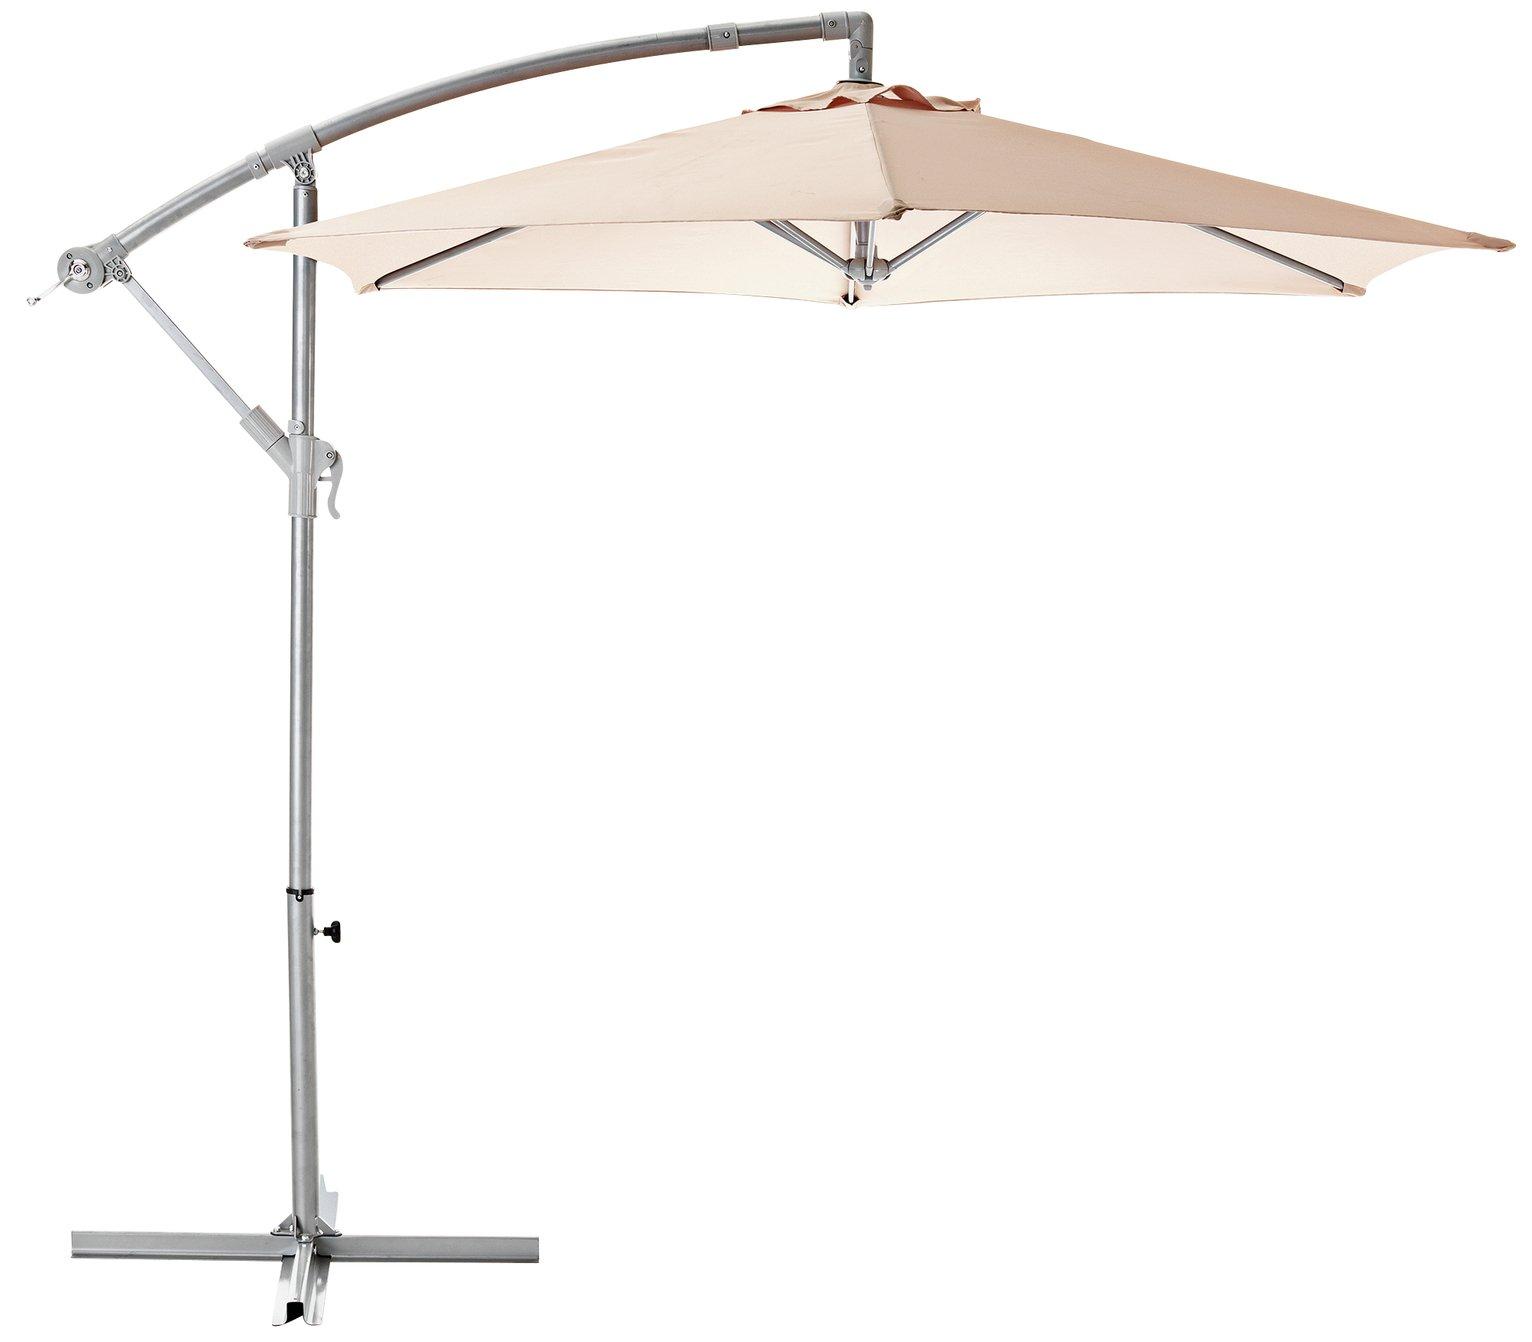 Argos Home 2.5m Overhanging Garden Parasol - Cream